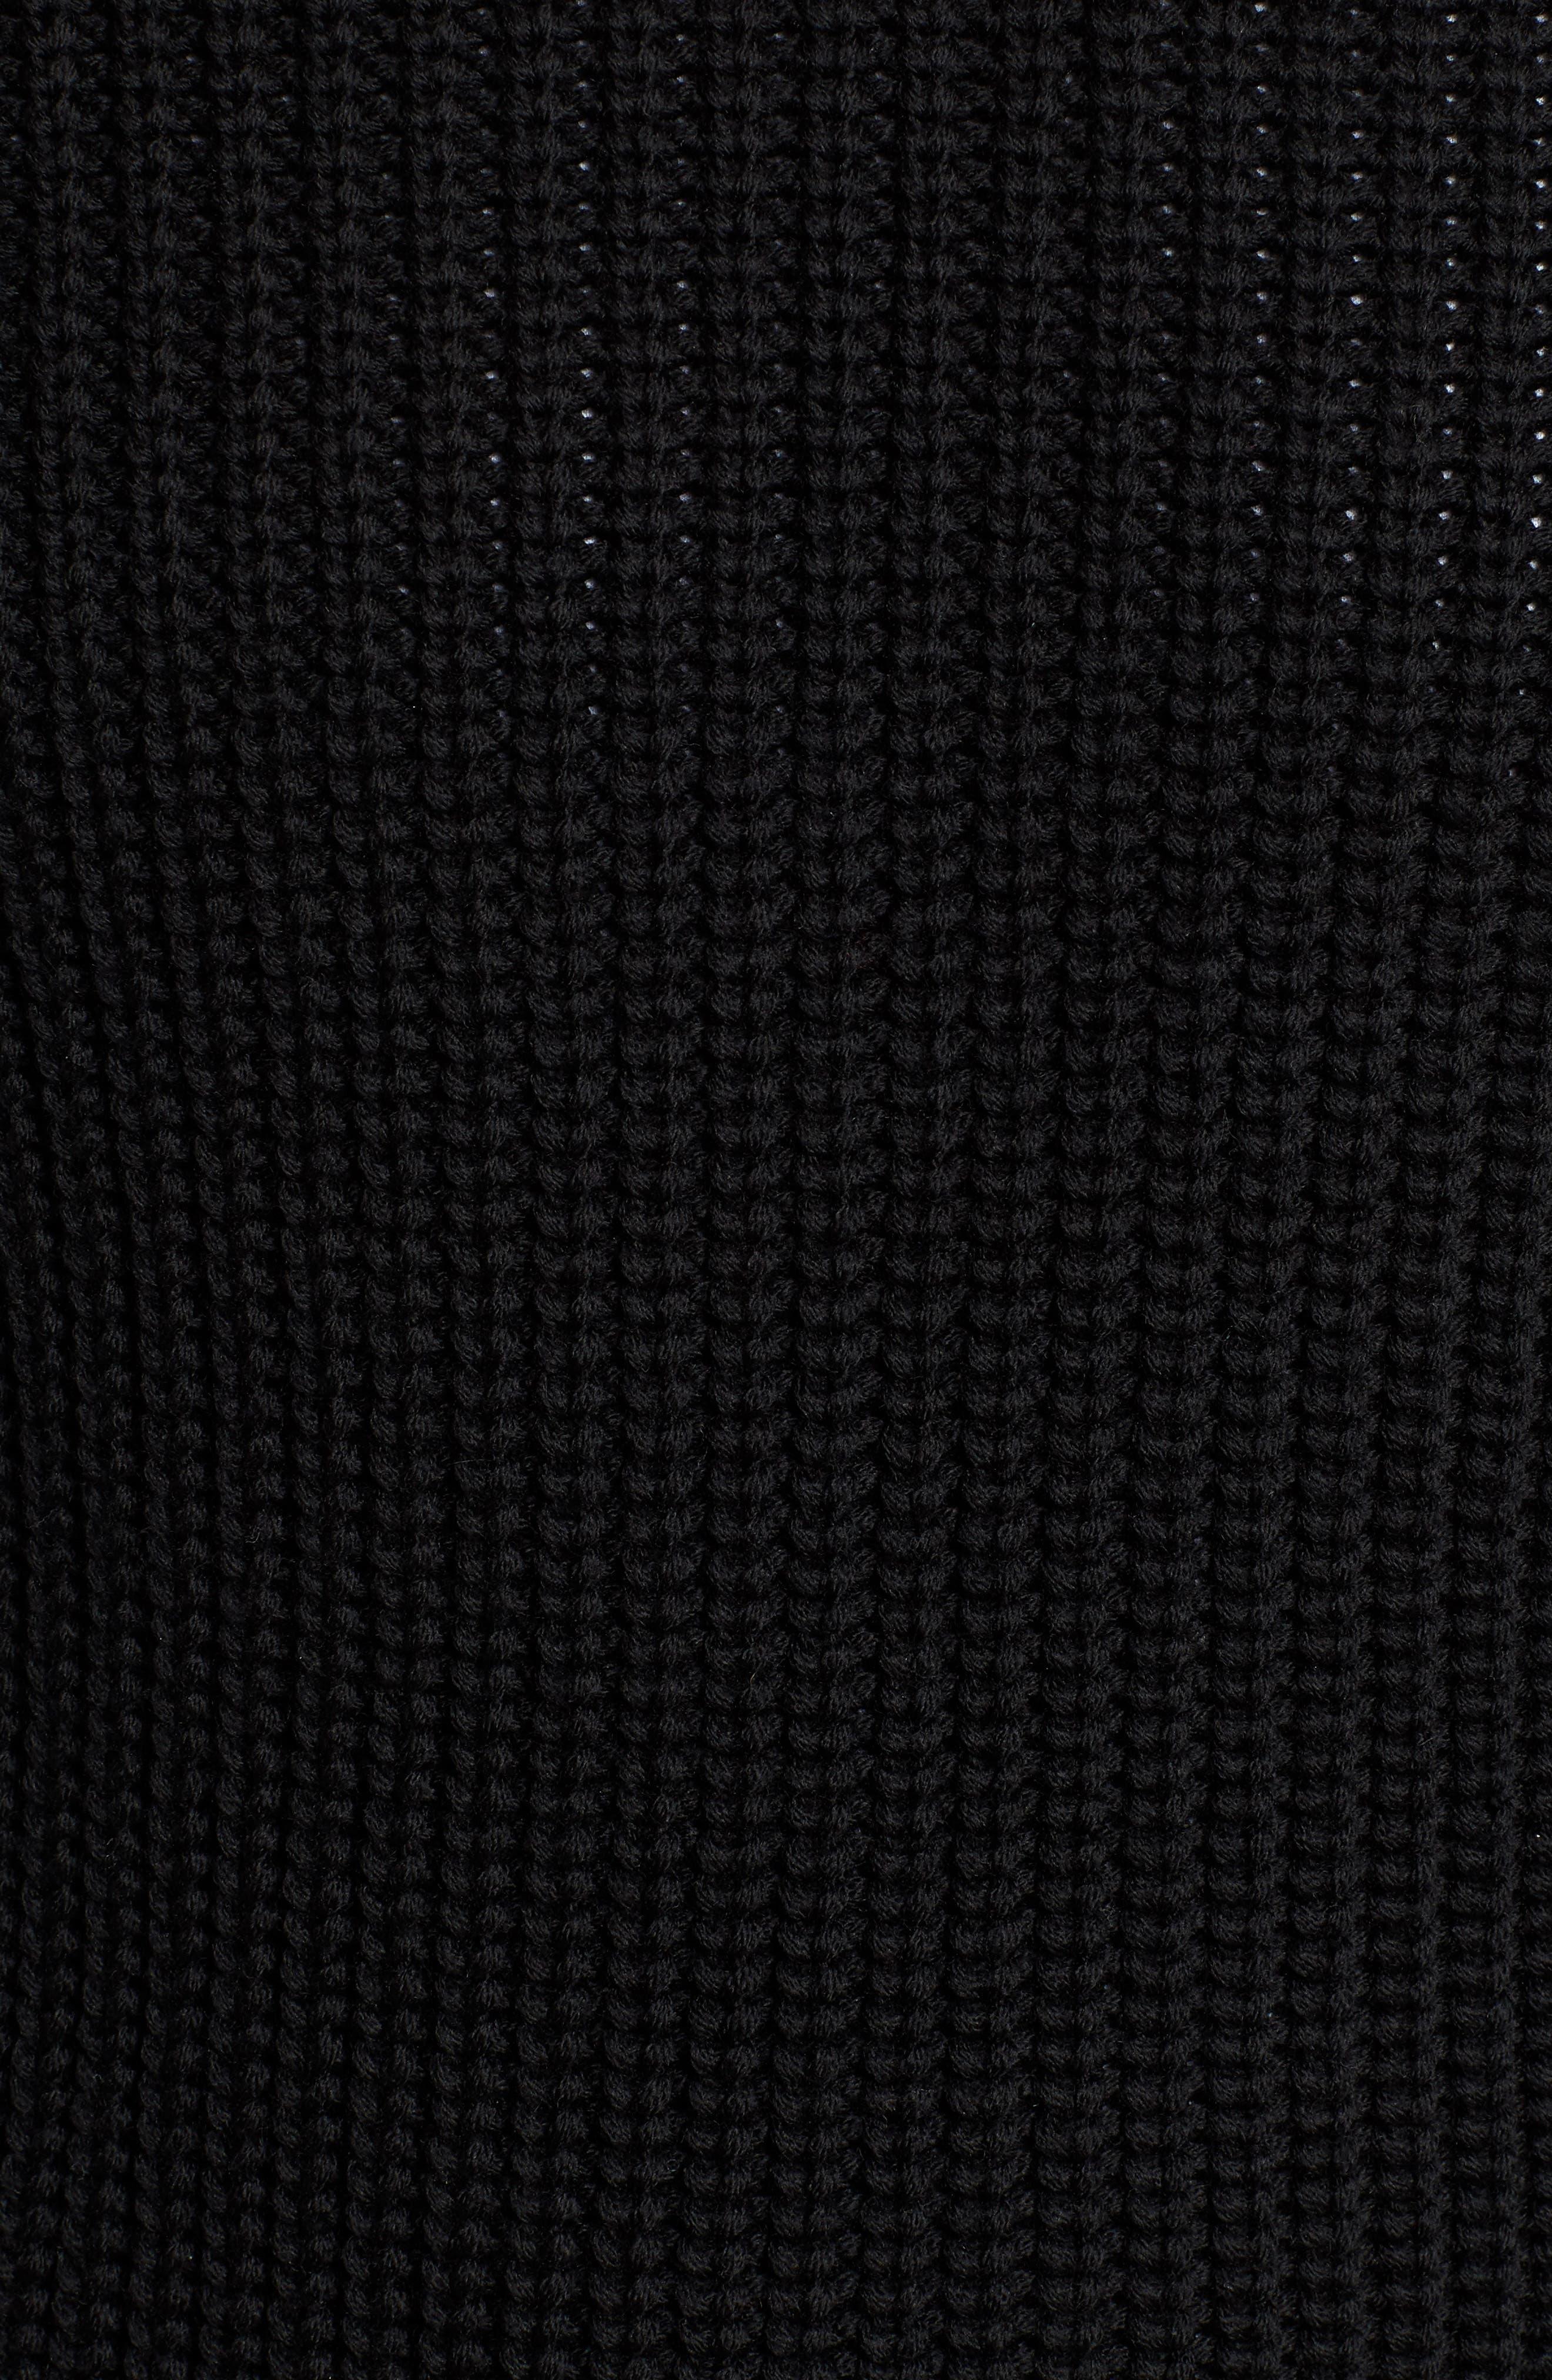 Galloway Regular Fit Merino Wool Sweater,                             Alternate thumbnail 5, color,                             BLACK